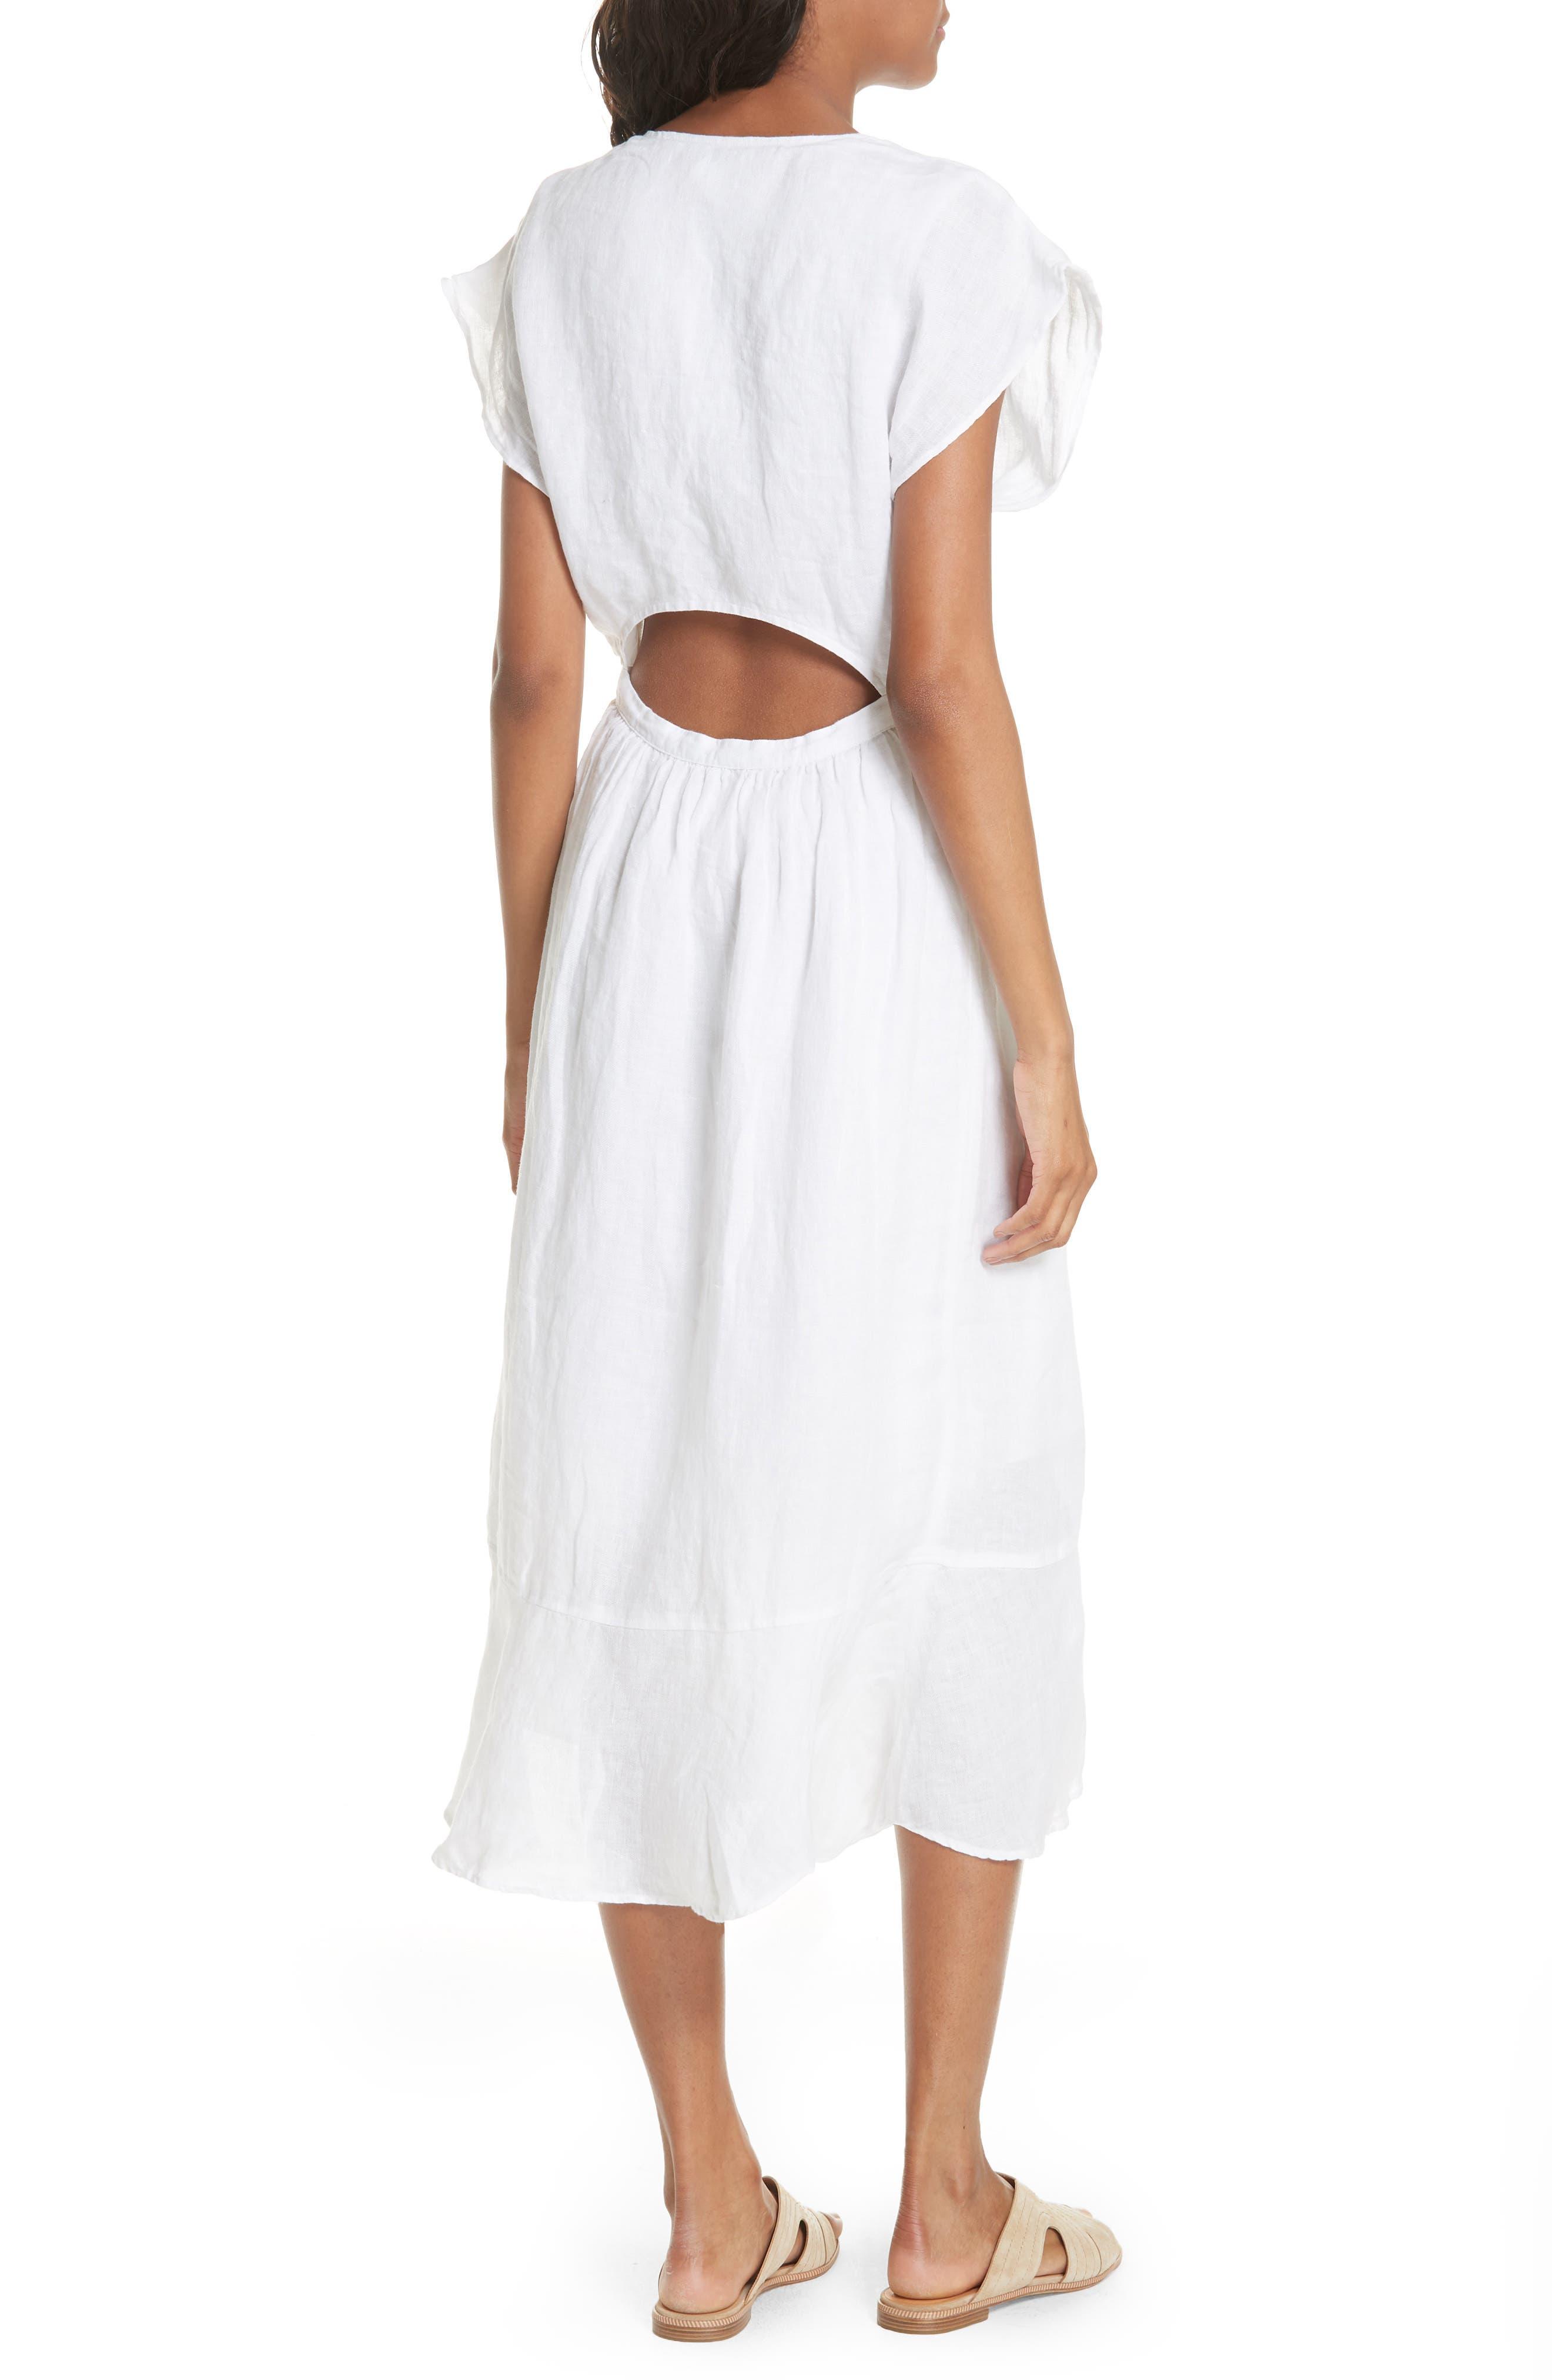 Filma Back Cutout Linen Wrap Dress,                             Alternate thumbnail 2, color,                             120